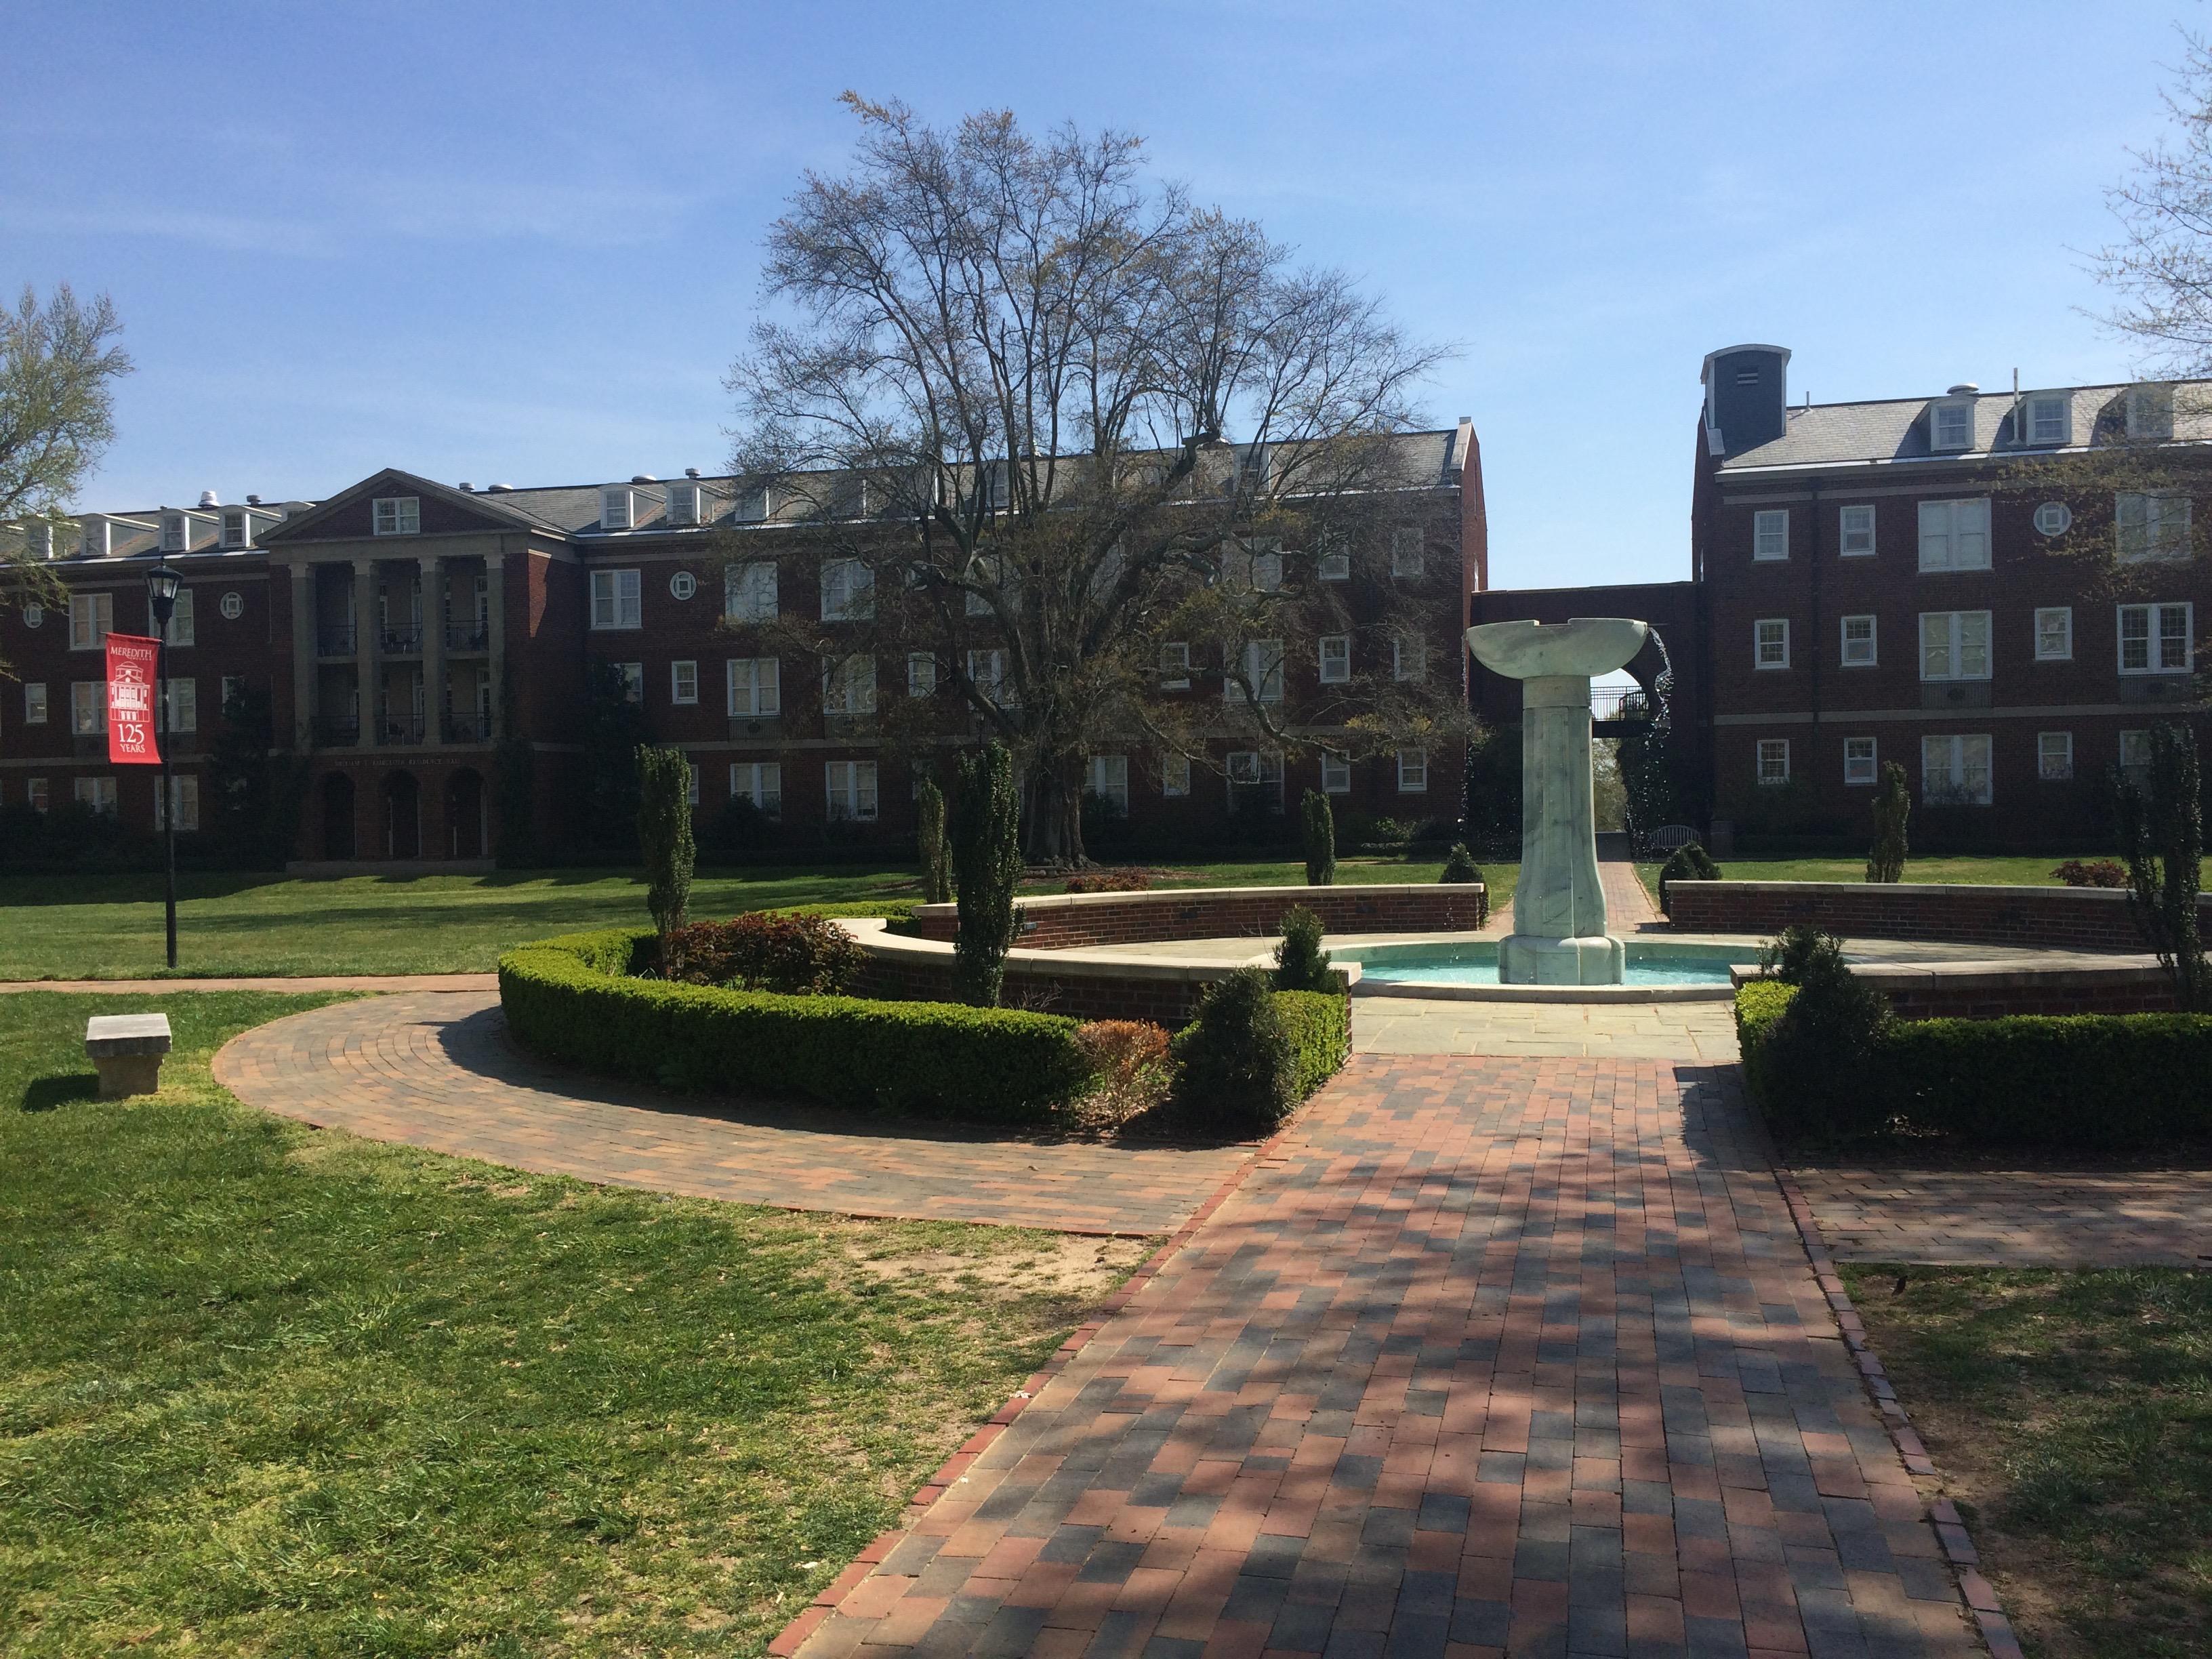 Four dorms sit in this original quad: Stringfield, Vann, Faircloth, and Brewer.